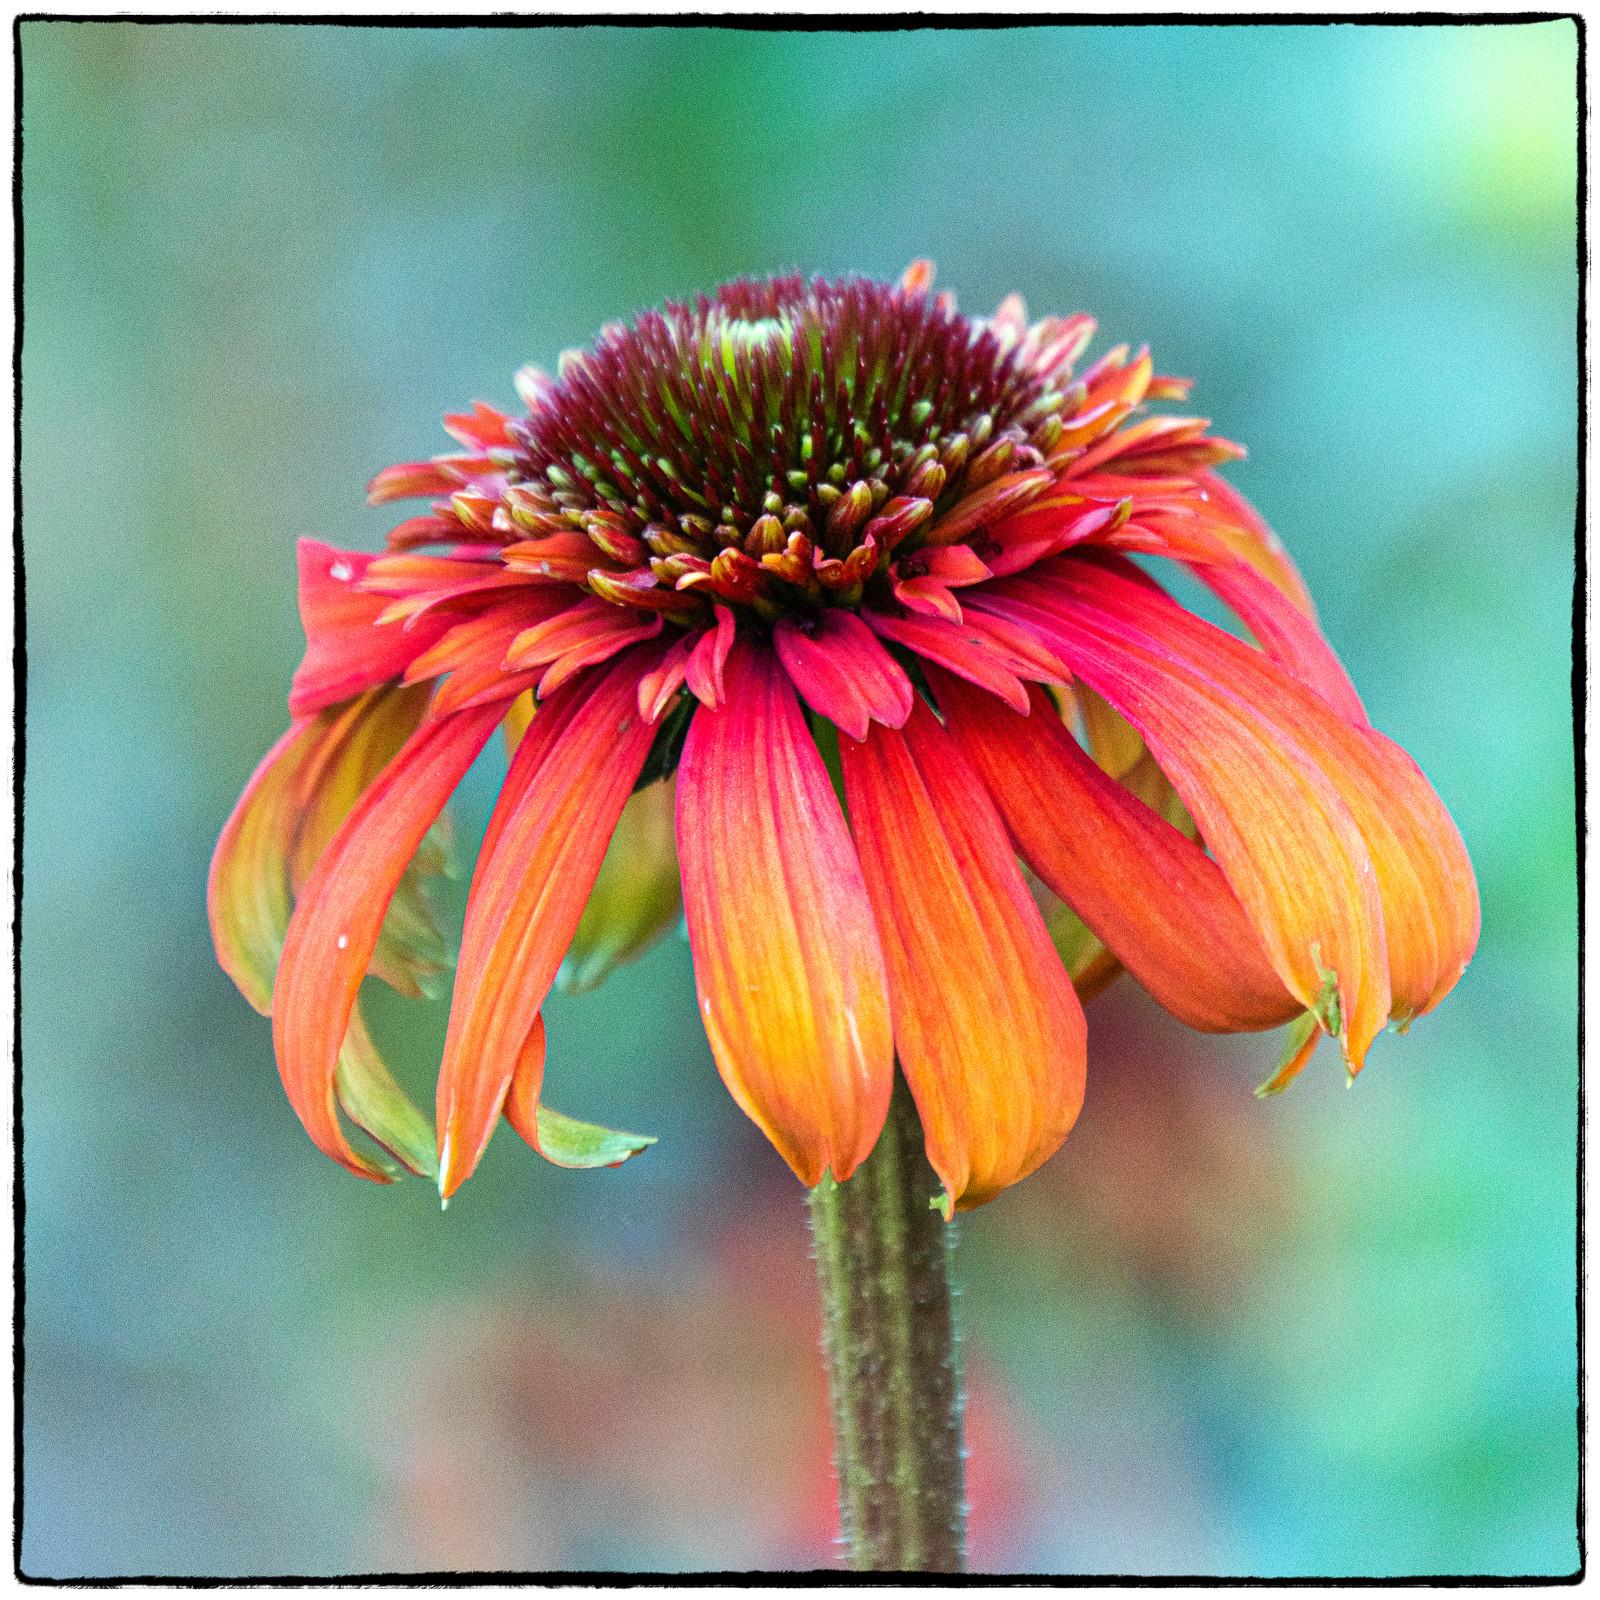 COLOUR - Summer Bloom by Iris Rainey (9 marks)